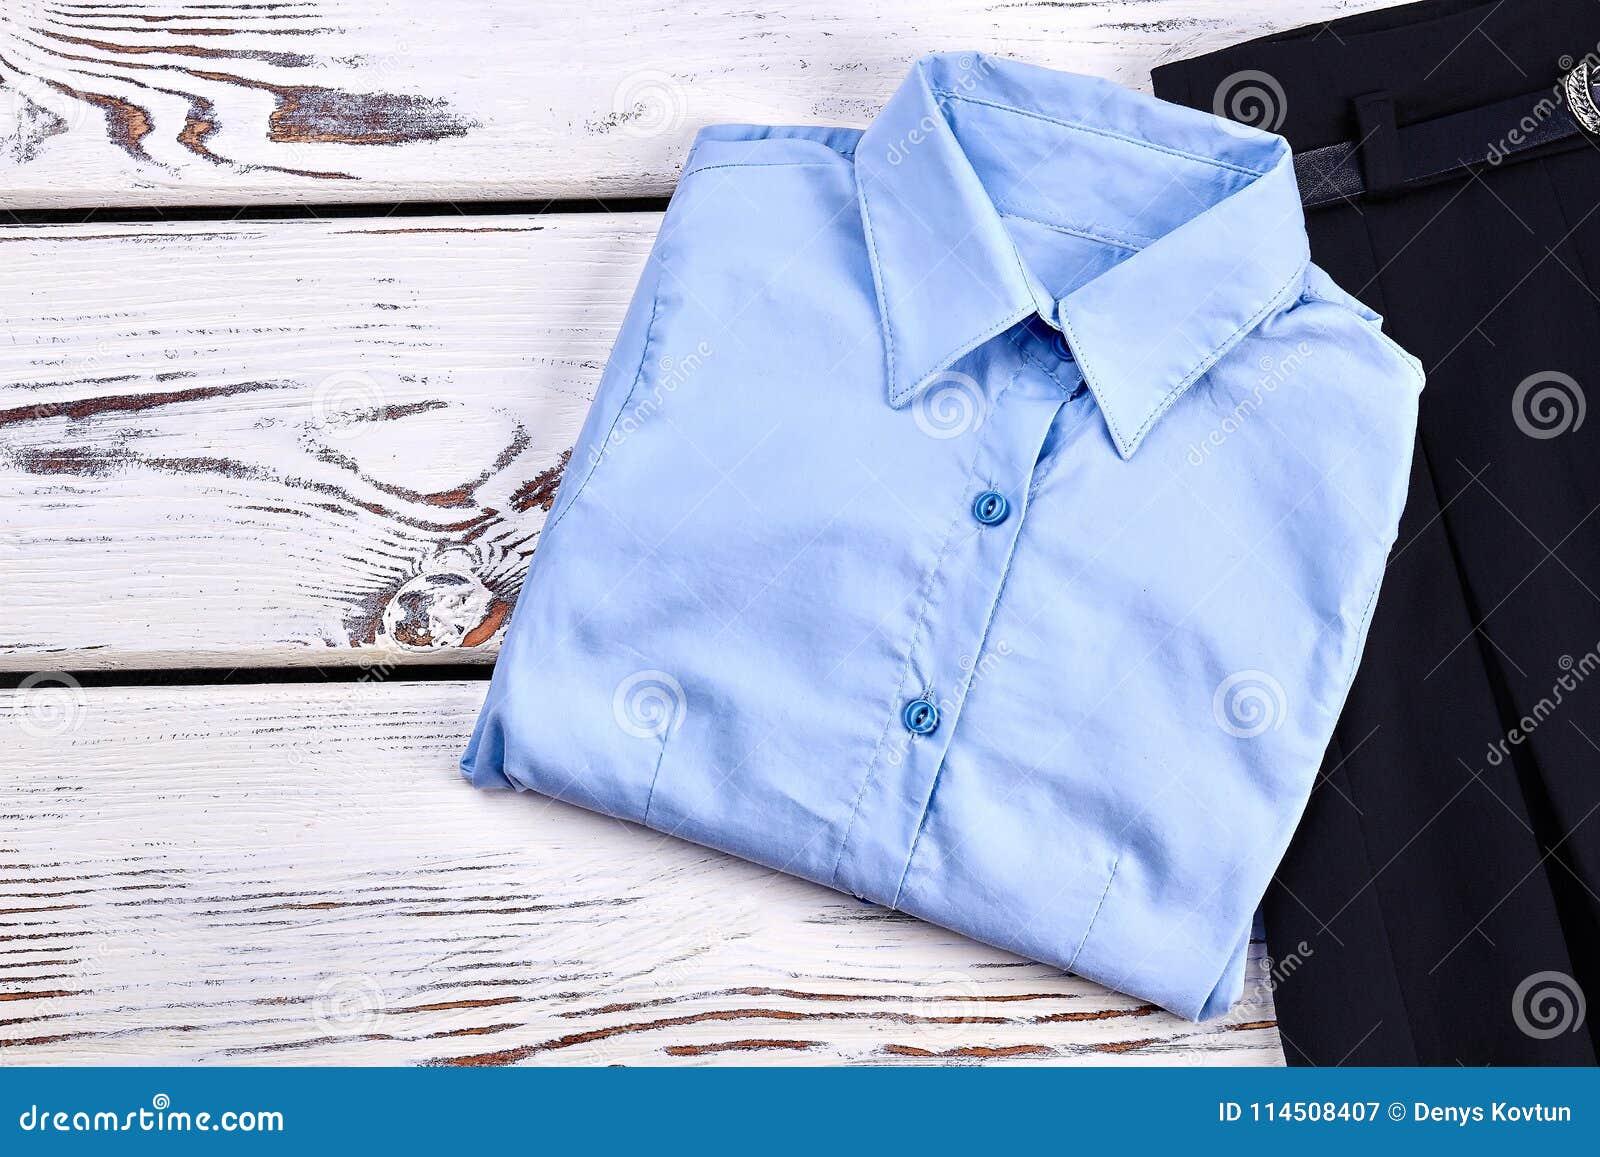 New Folded Light Blue Girls Shirt Stock Image Image Of Beautiful